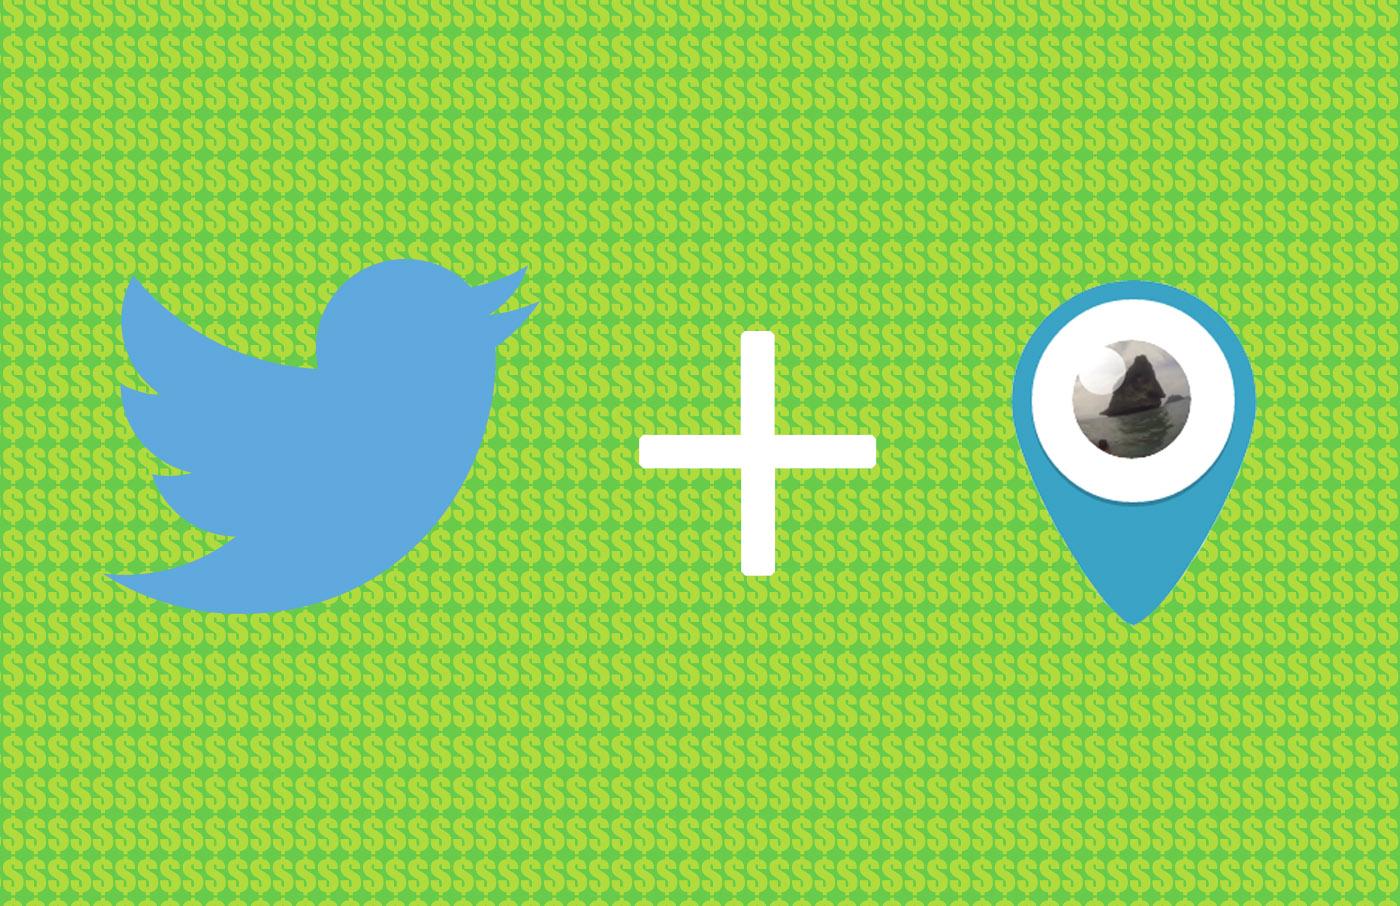 Twitter Confirms Periscope Acquisition via Retweet